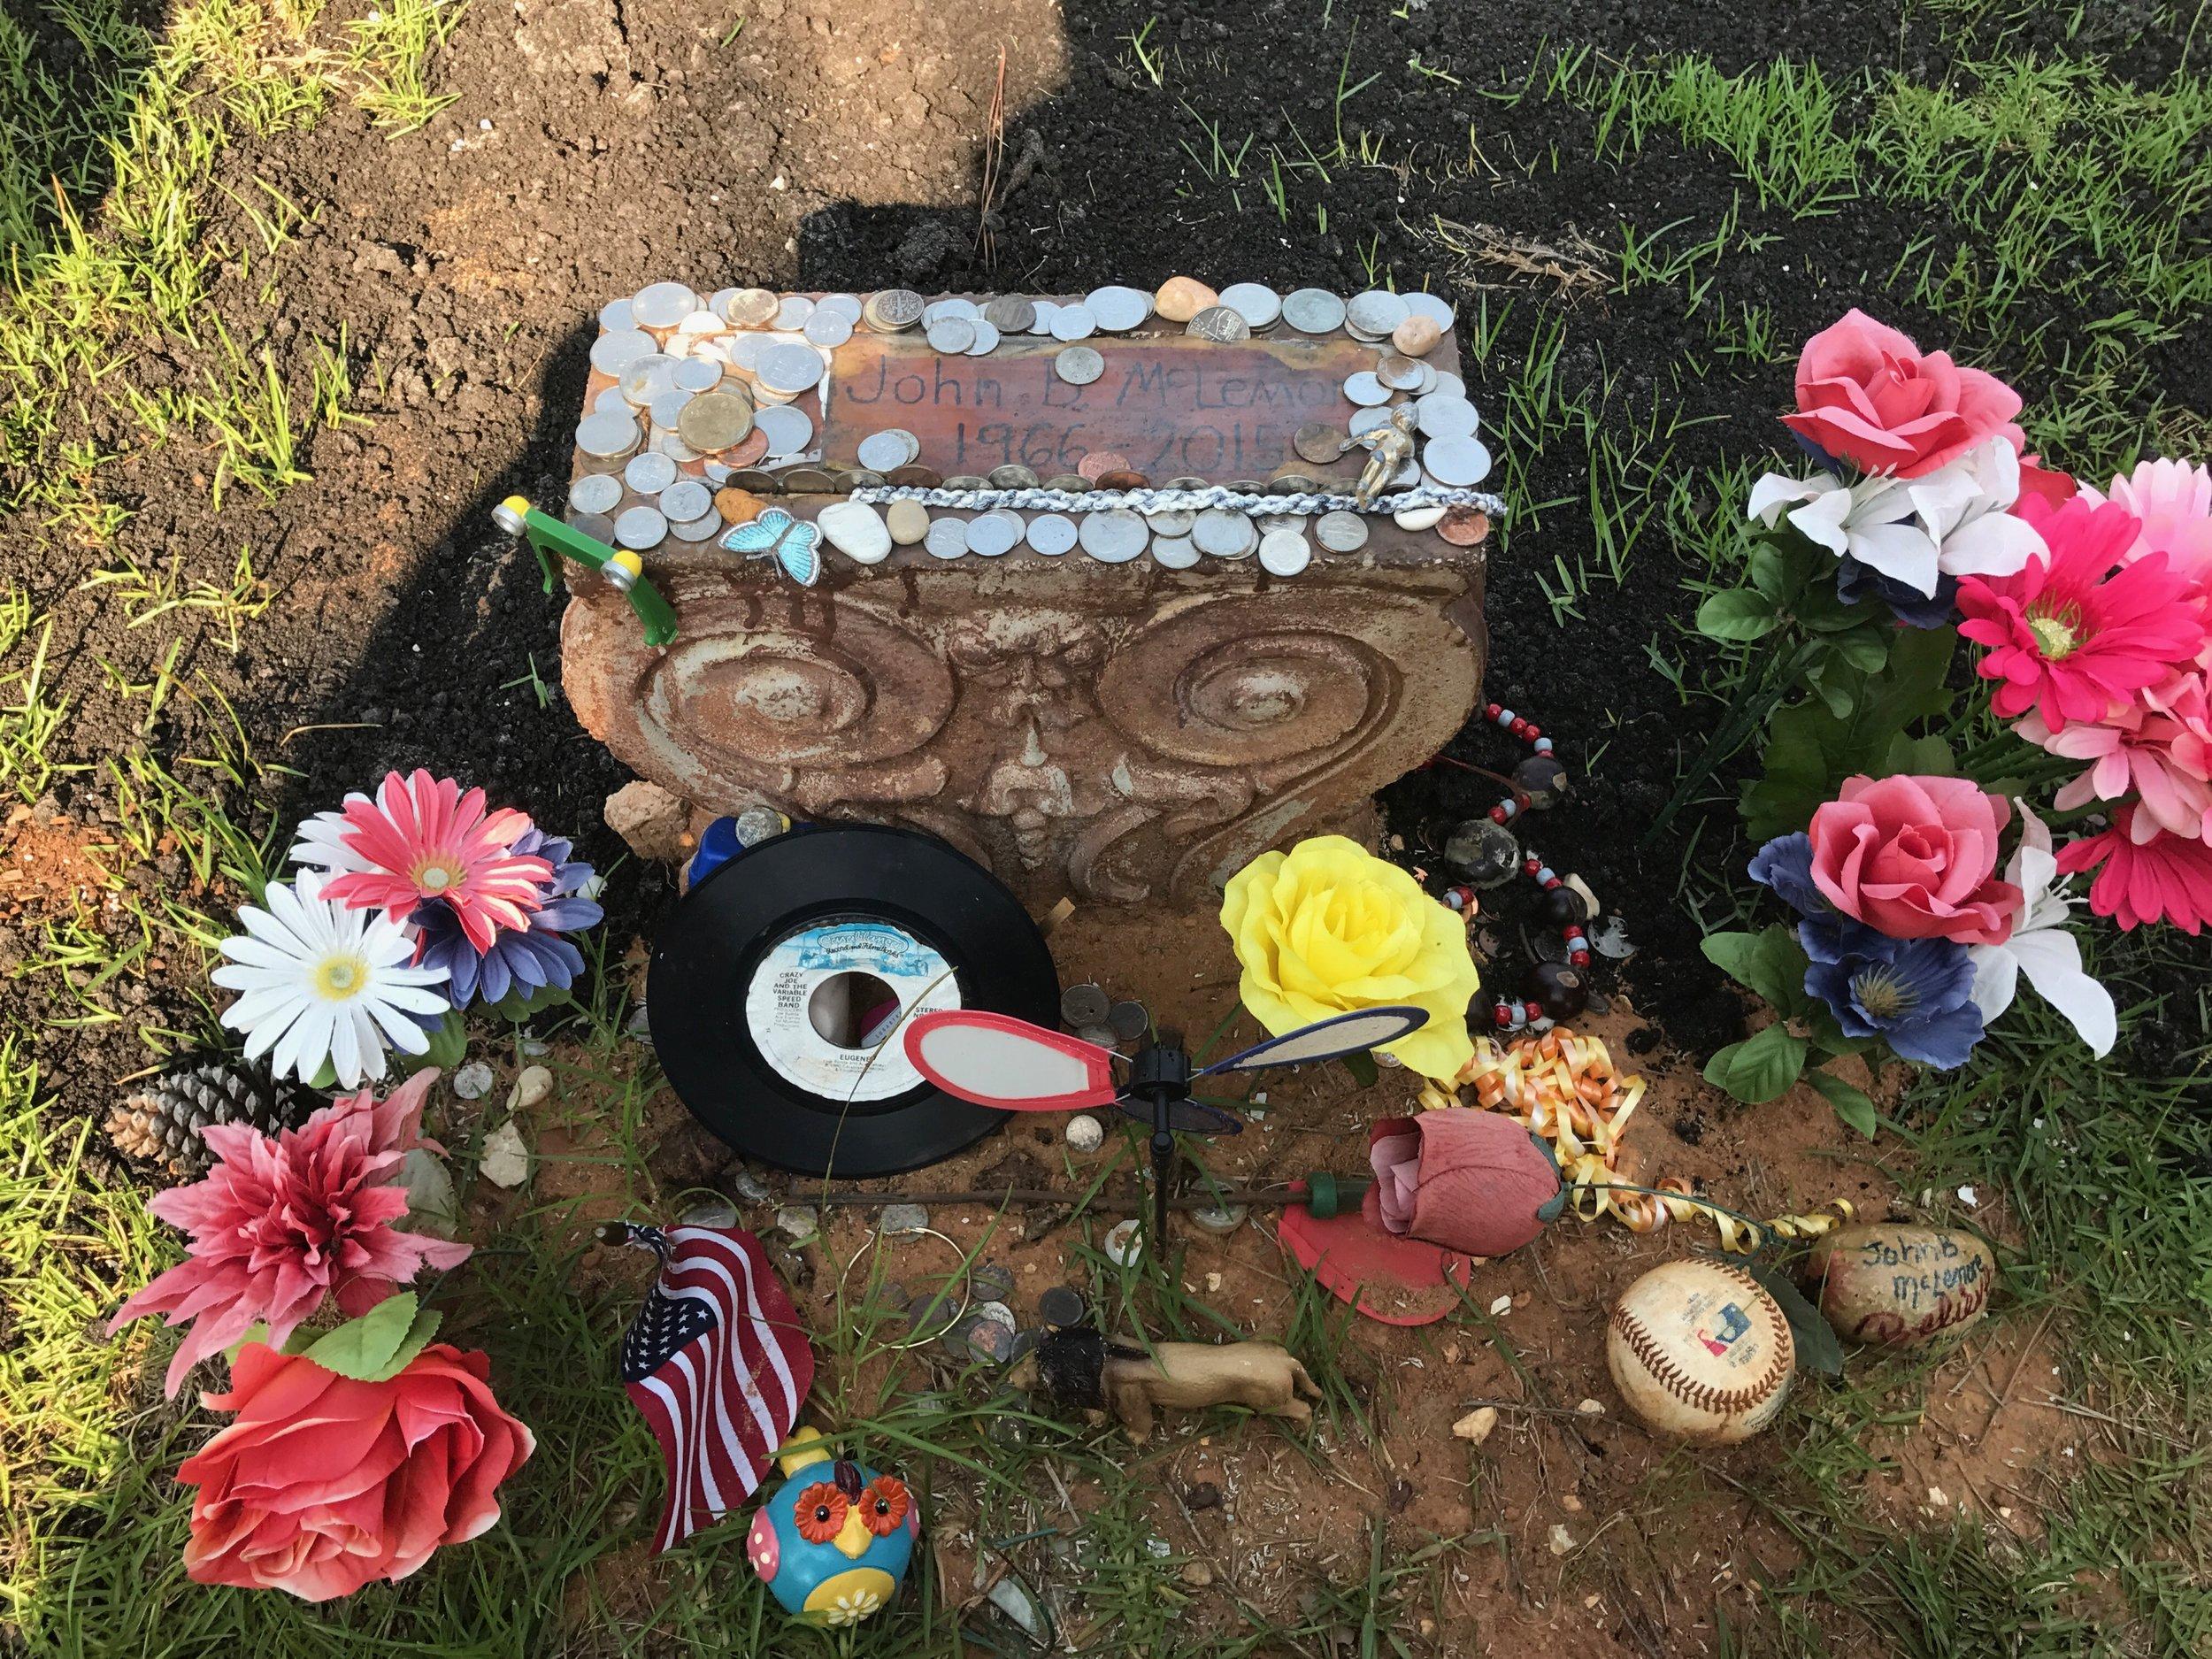 John B. McLemore's grave in Woodstock, Alabama. Photo by Kelly Vines.